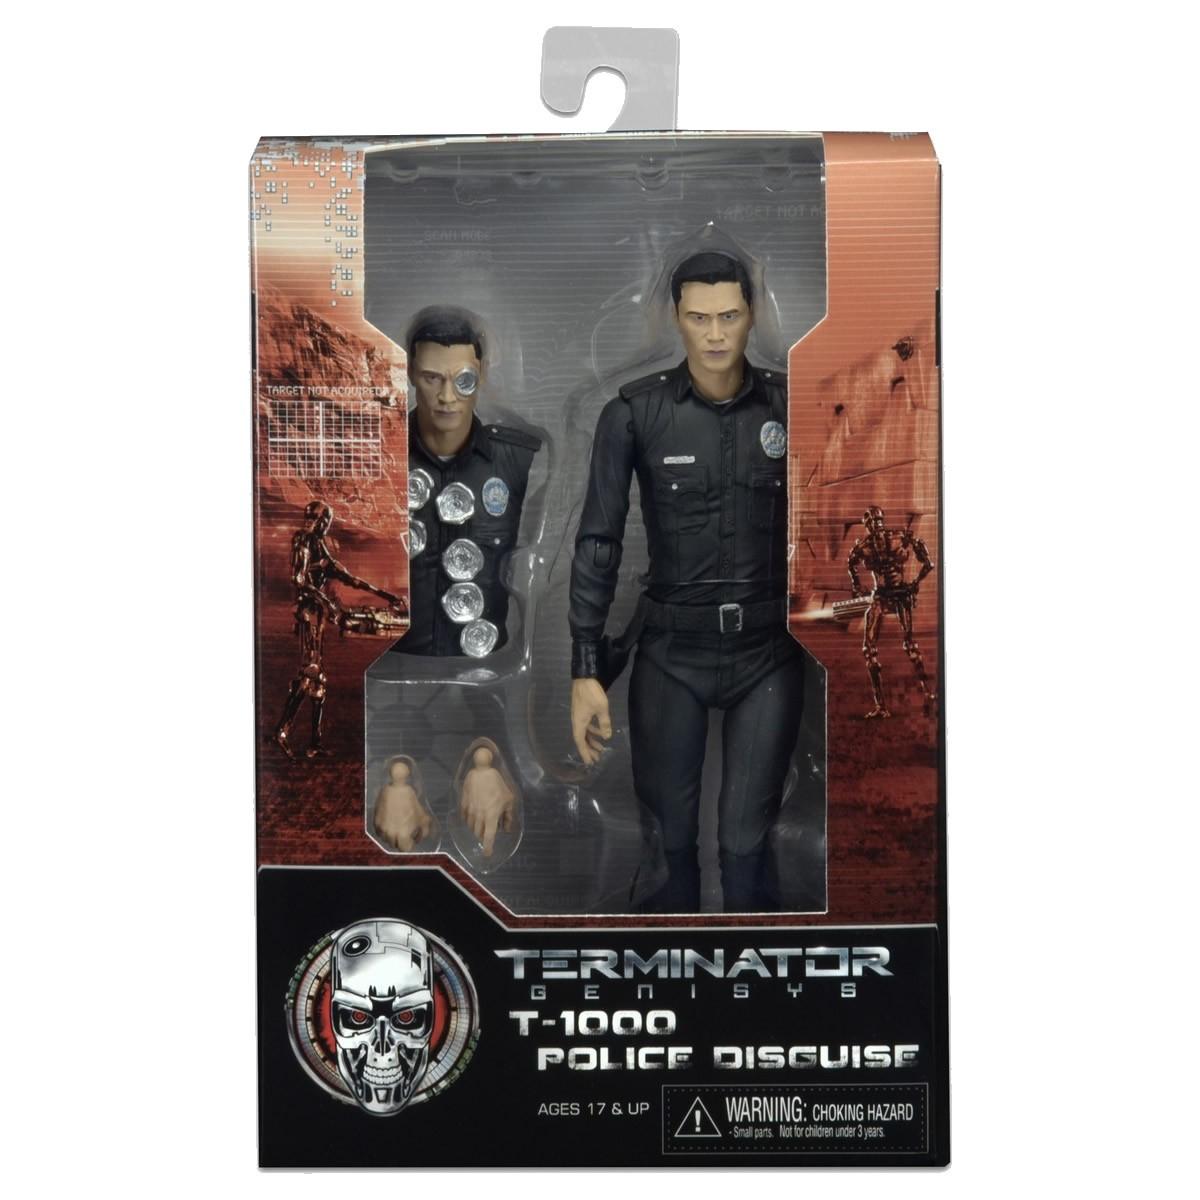 T-1000 - Terminator Genisys - Series 1 - NECA